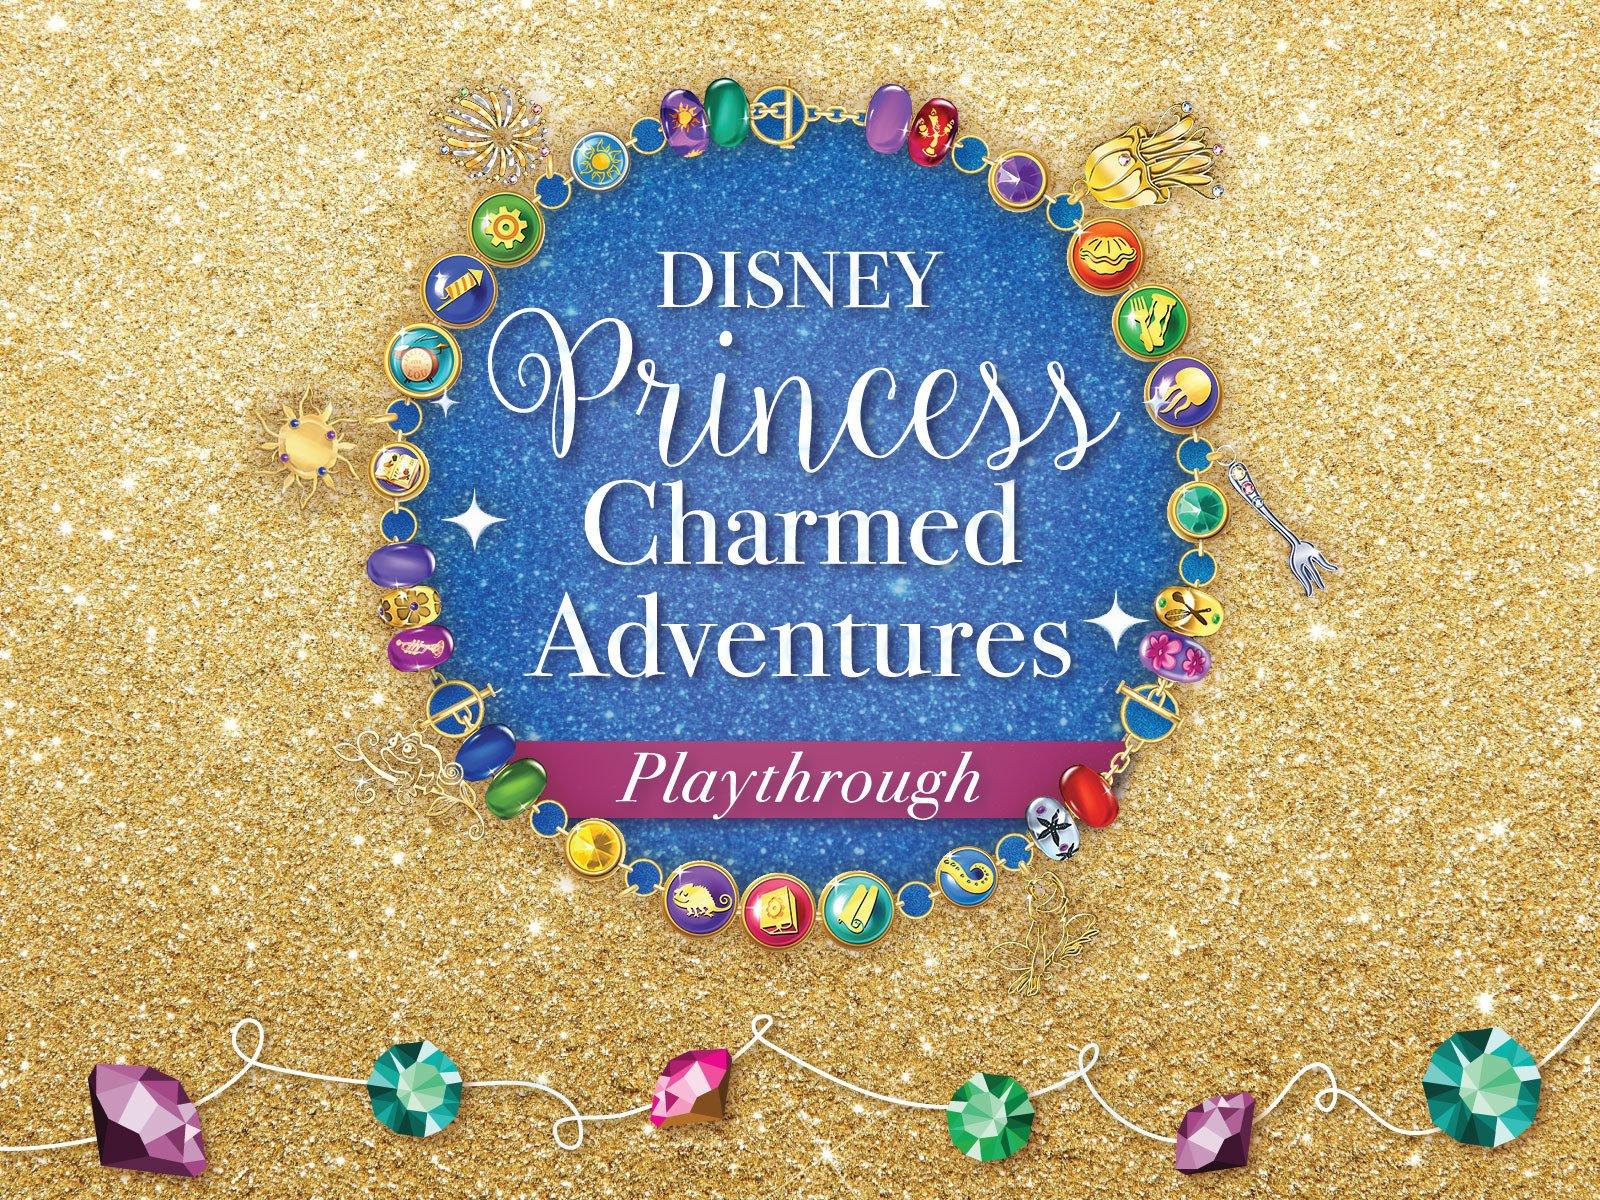 Clip: Disney Princess Charmed Adventures Playthrough - Season 1